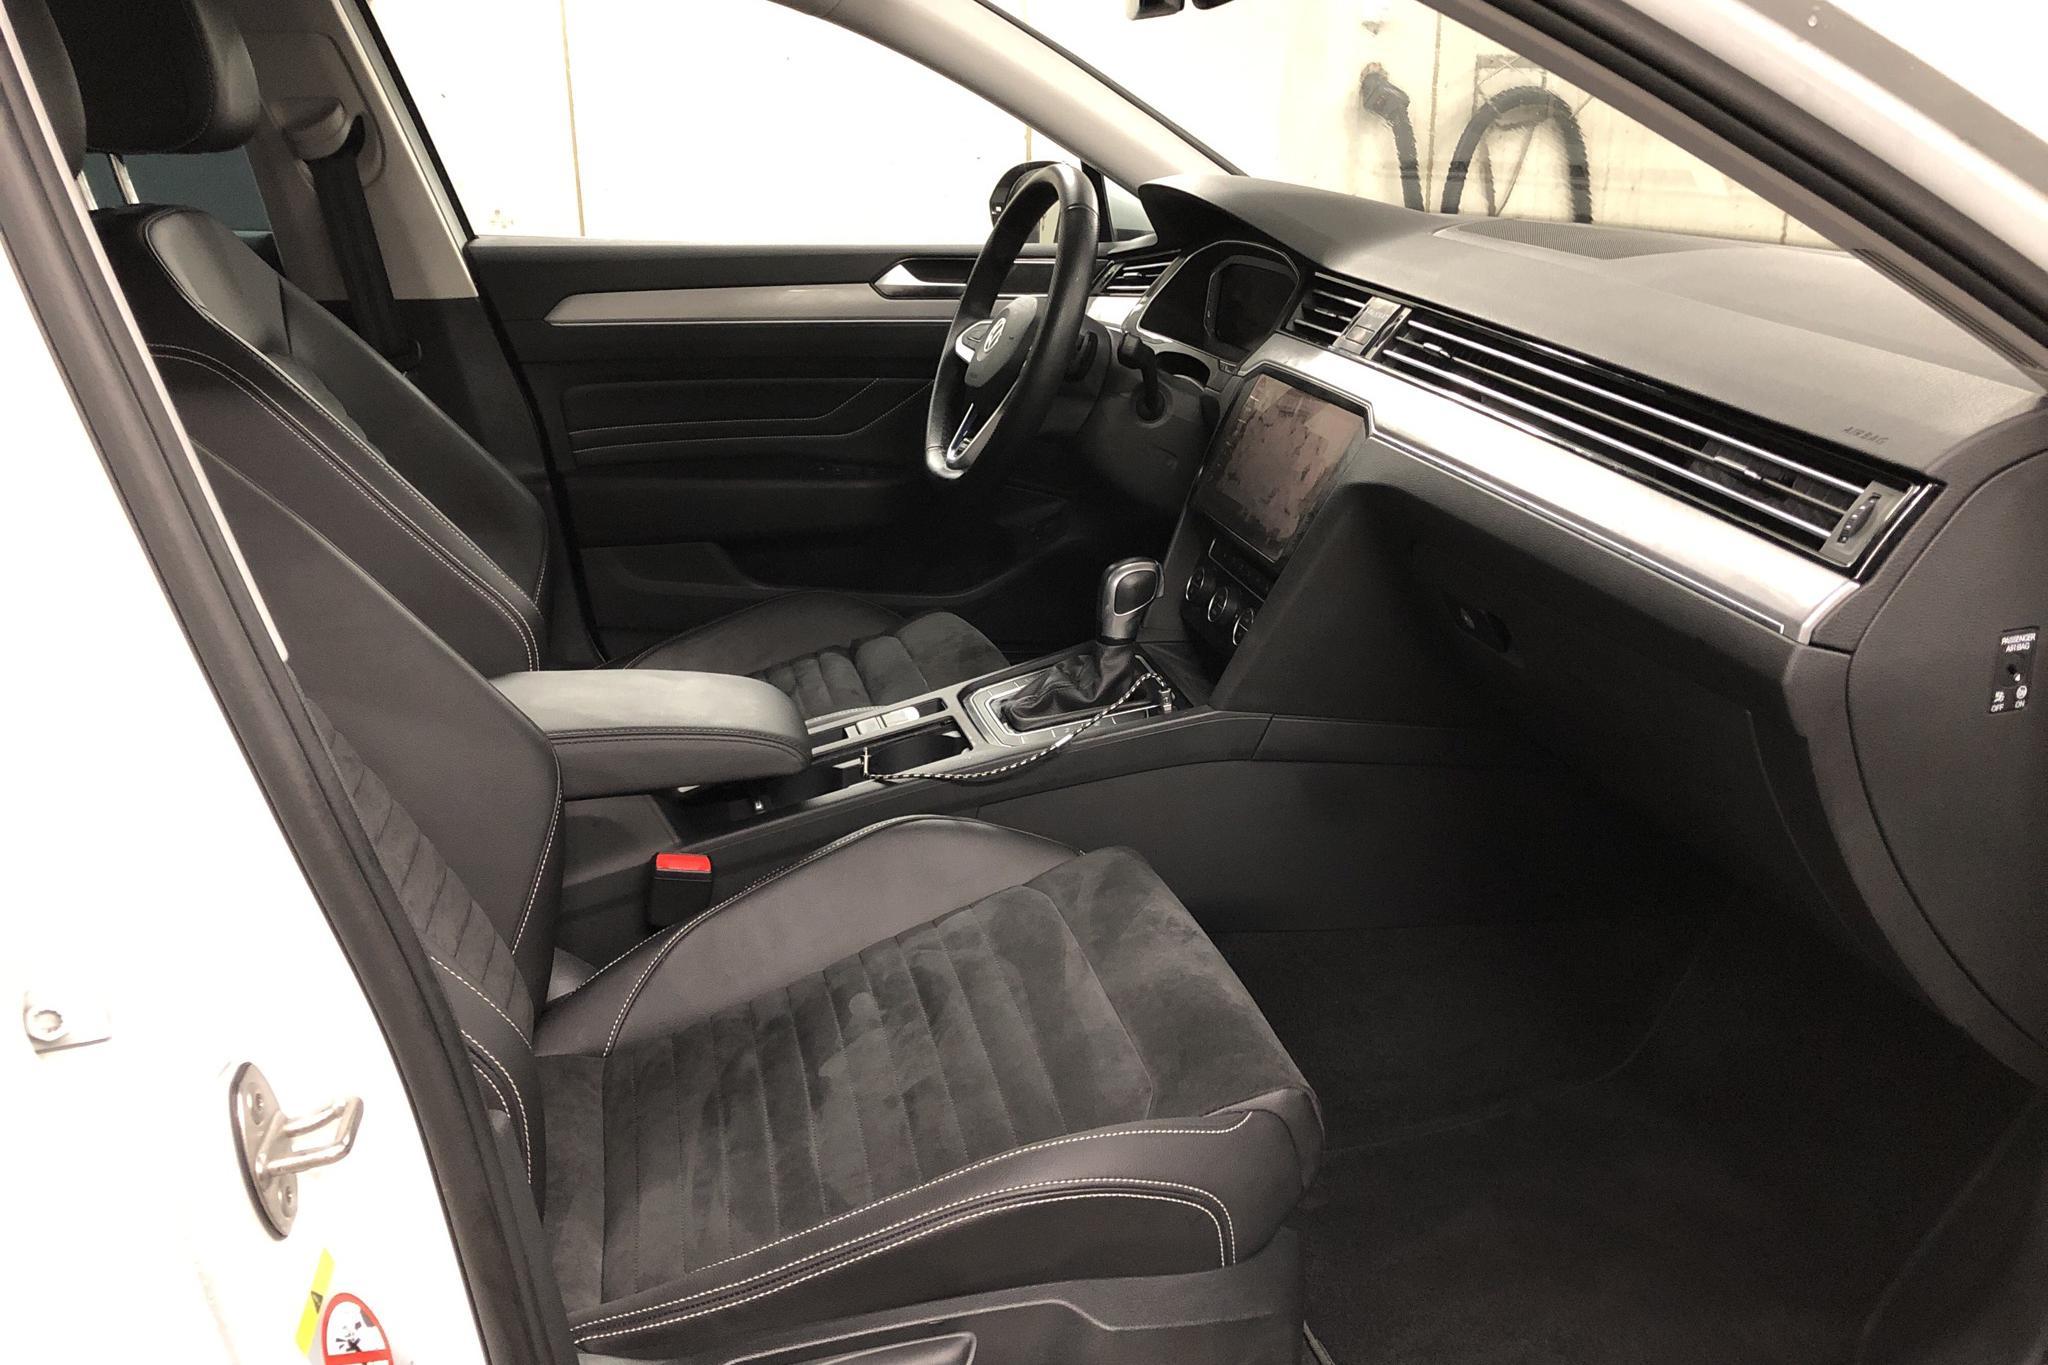 VW Passat 1.4 Plug-in-Hybrid Sportscombi (218hk) - 2 440 mil - Automat - vit - 2020